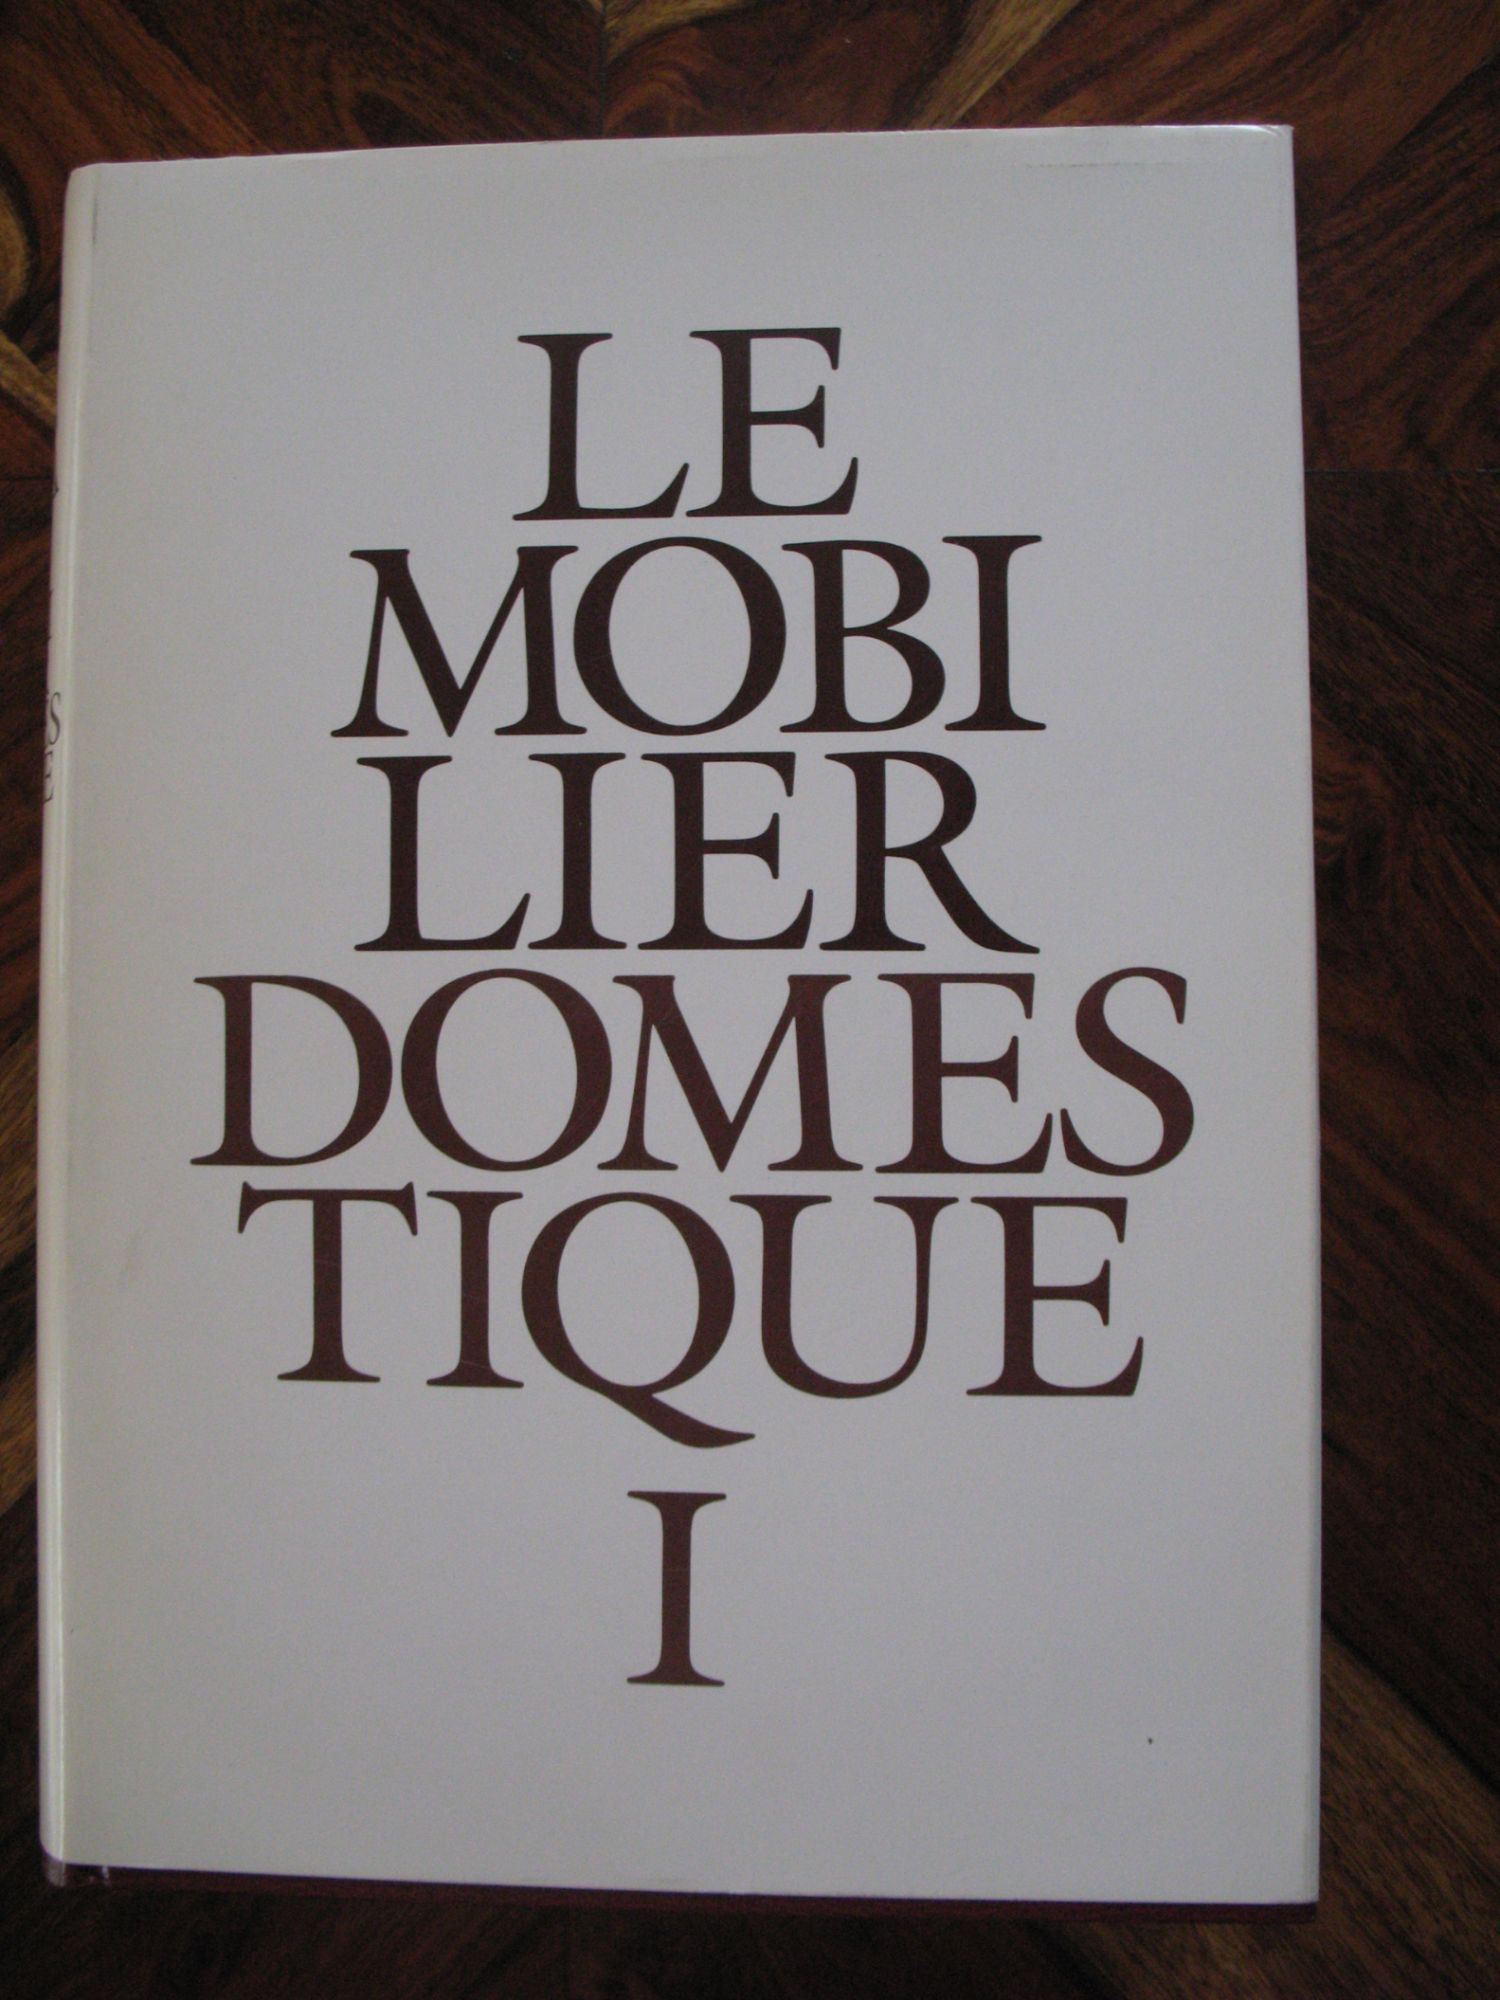 Imprimerie Nationale - Paris 01/11/1987